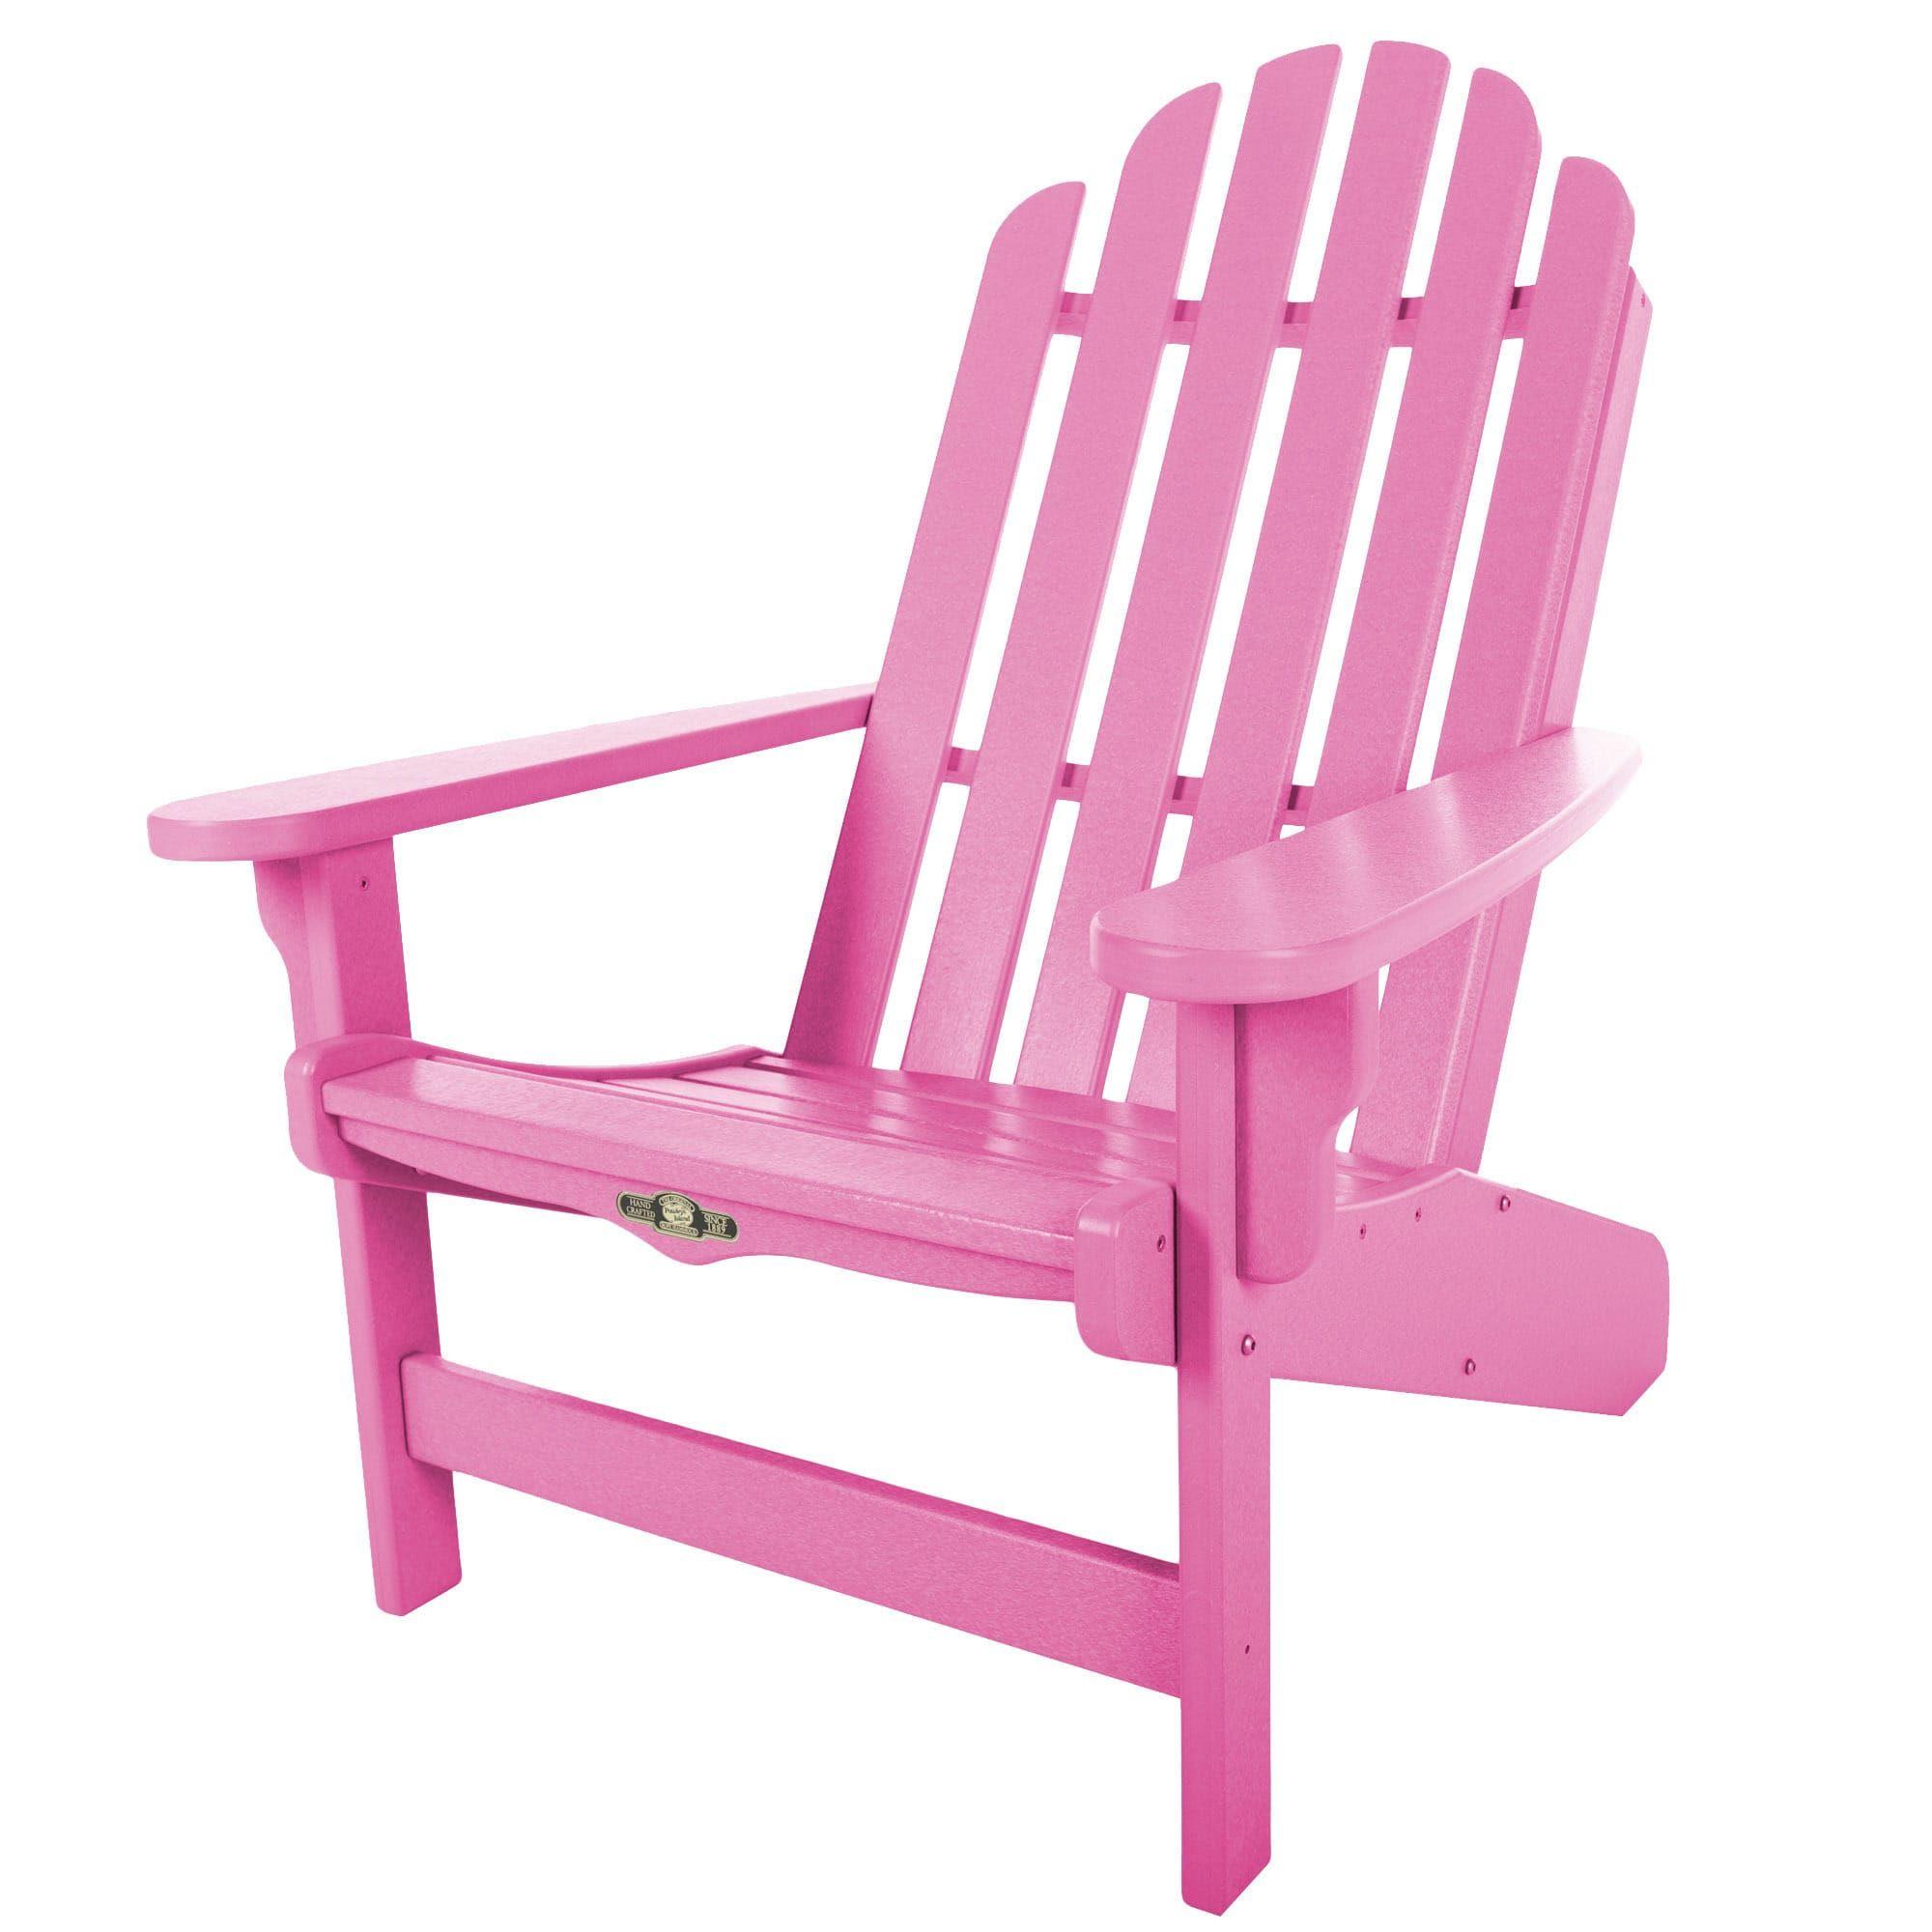 Pawleyus island essentials adirondack chair pink size single